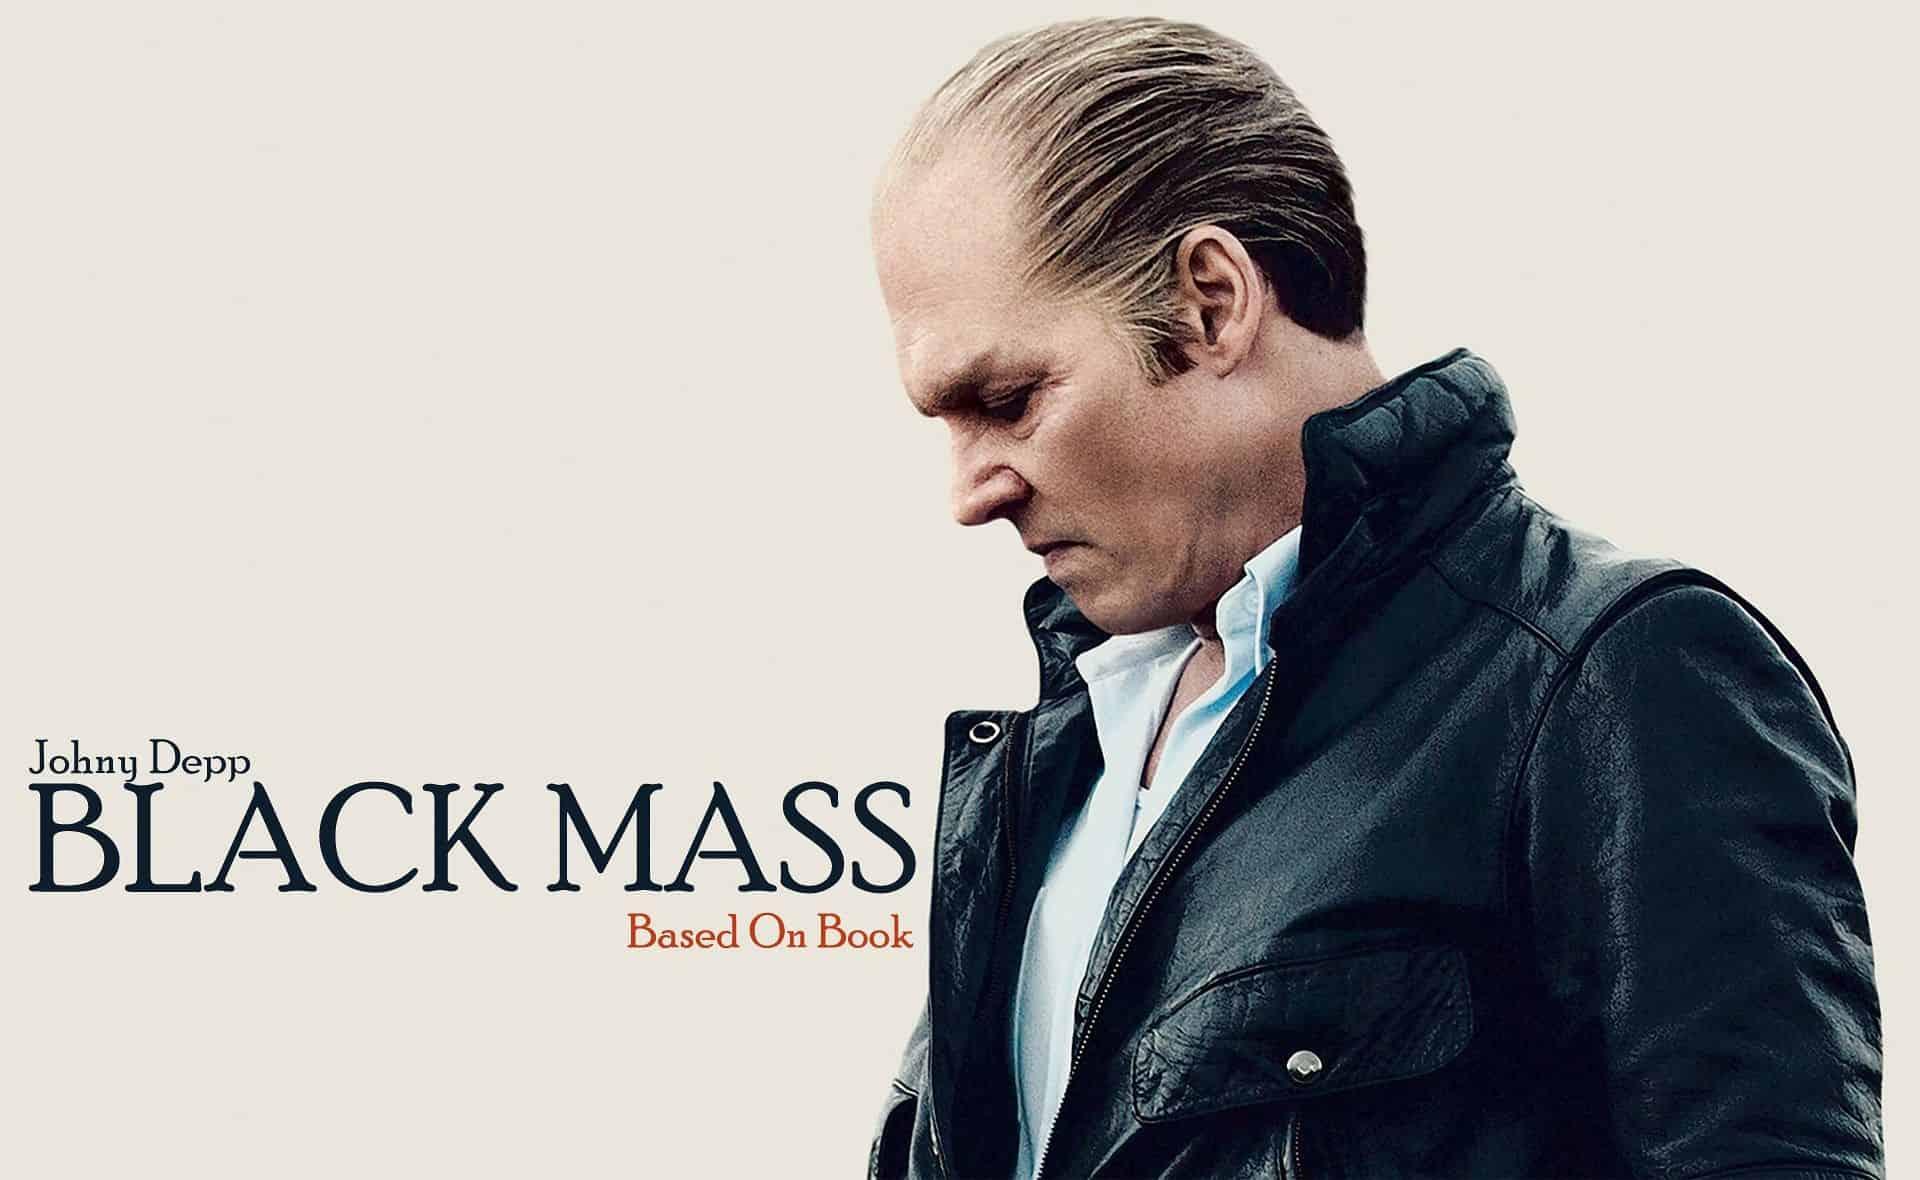 Black Mass 2015 - HistoryvsHollywoodcom